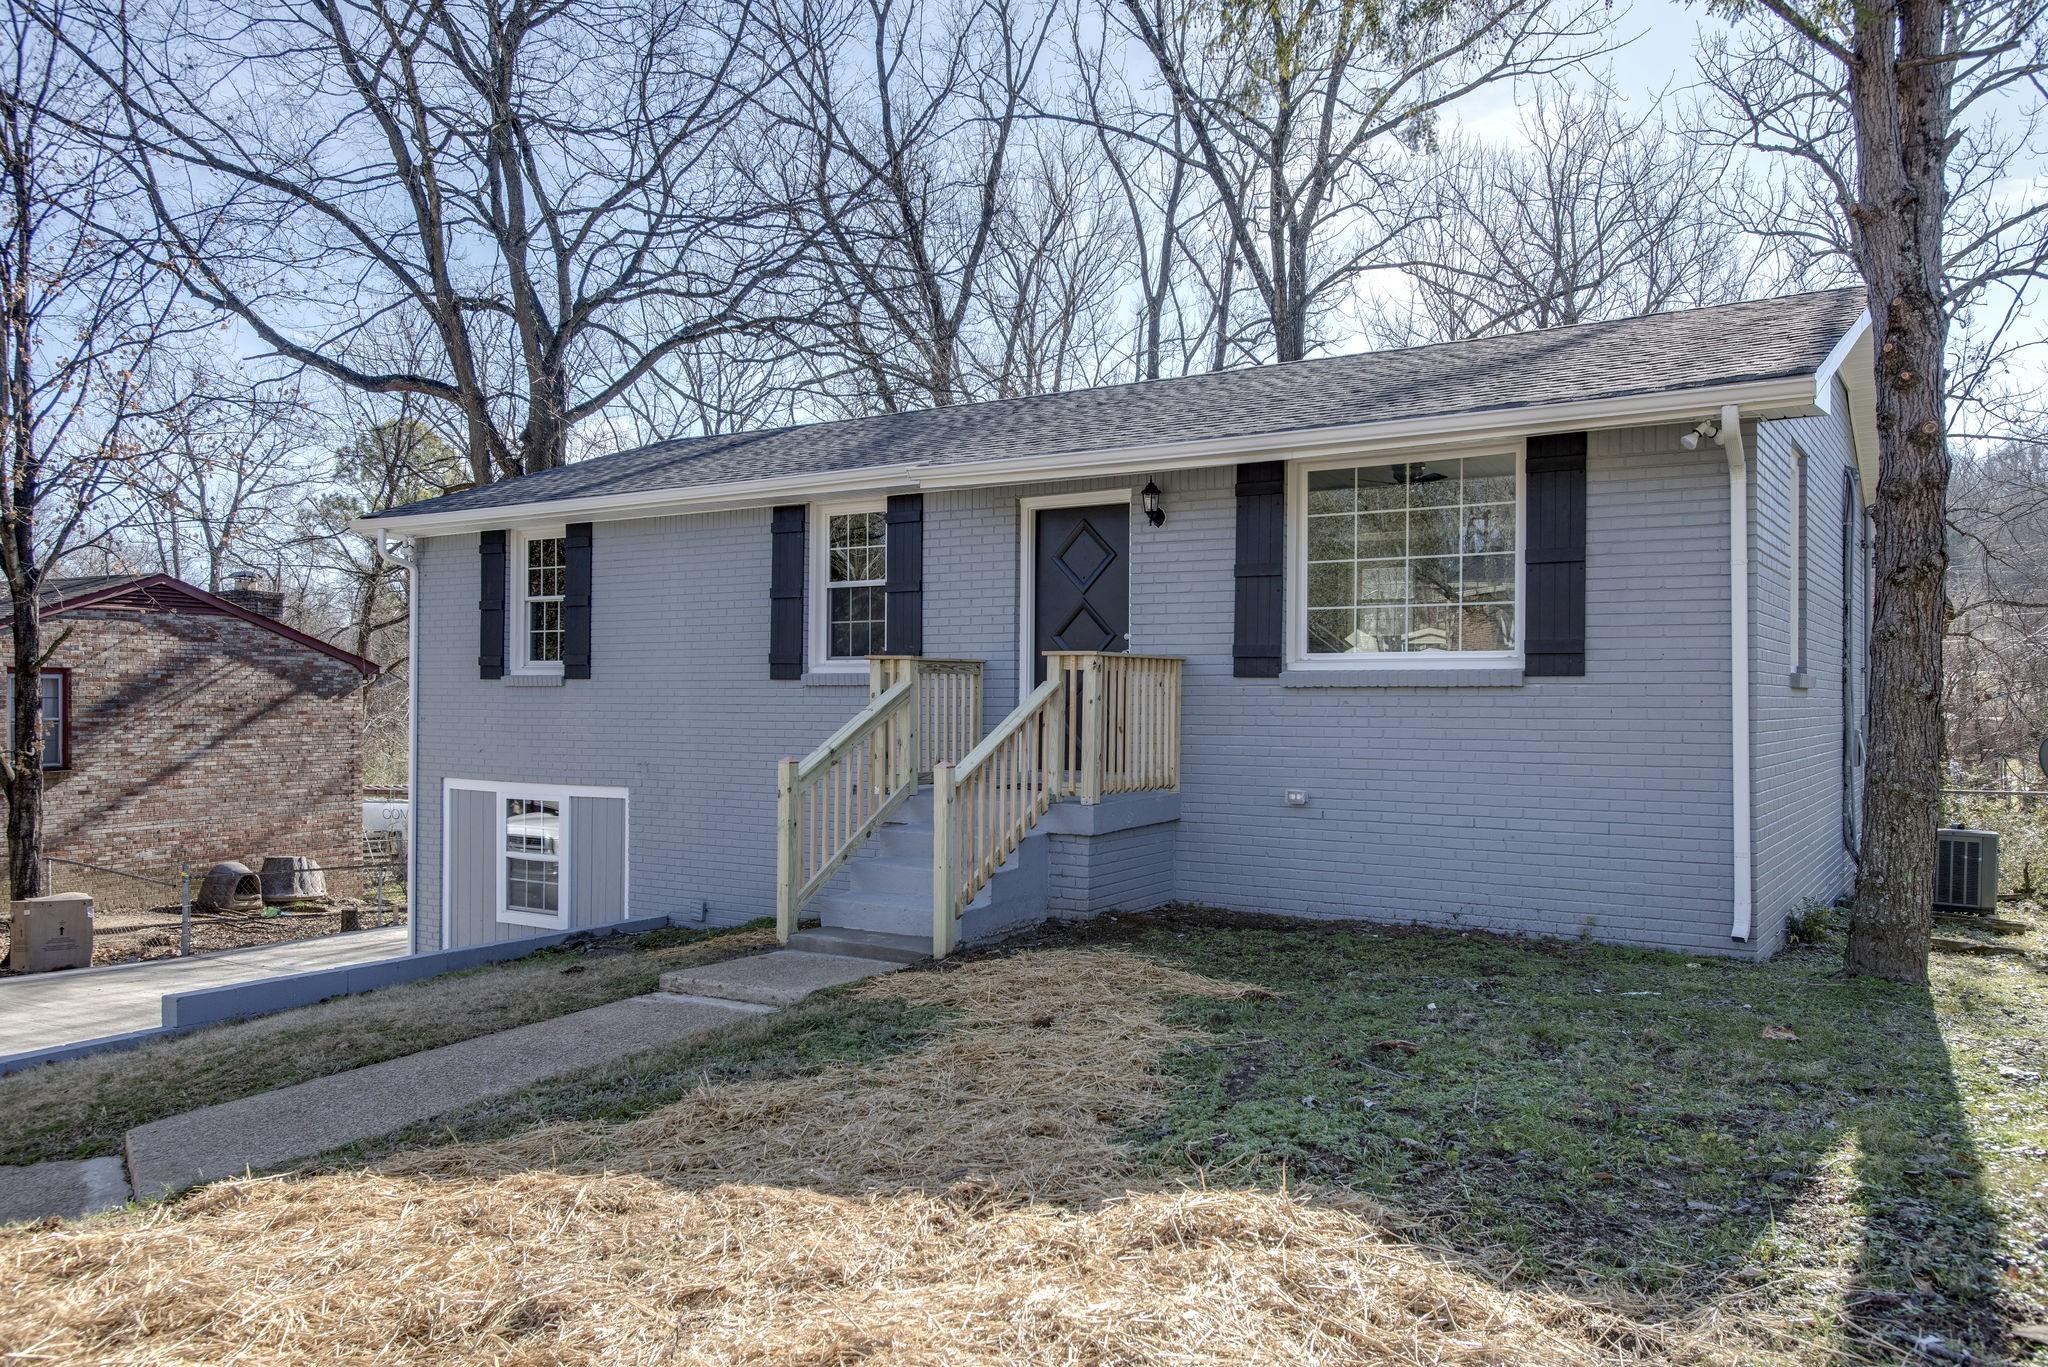 4980 Shihmen Dr, Antioch, TN 37013 - Antioch, TN real estate listing